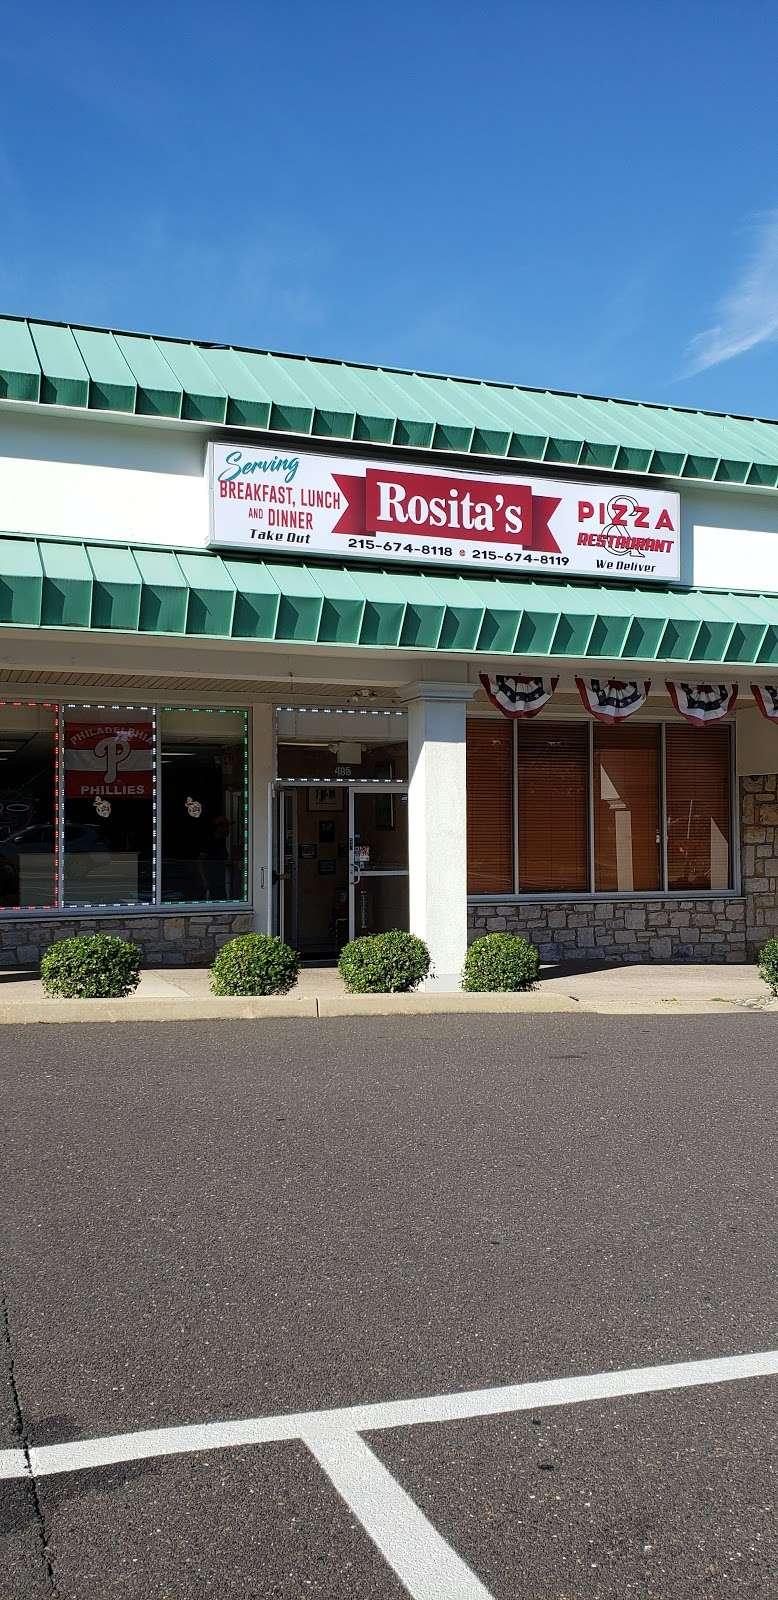 Rositas - restaurant  | Photo 2 of 2 | Address: 485 E County Line Rd Suite 1204, Hatboro, PA 19040, USA | Phone: (215) 674-8118